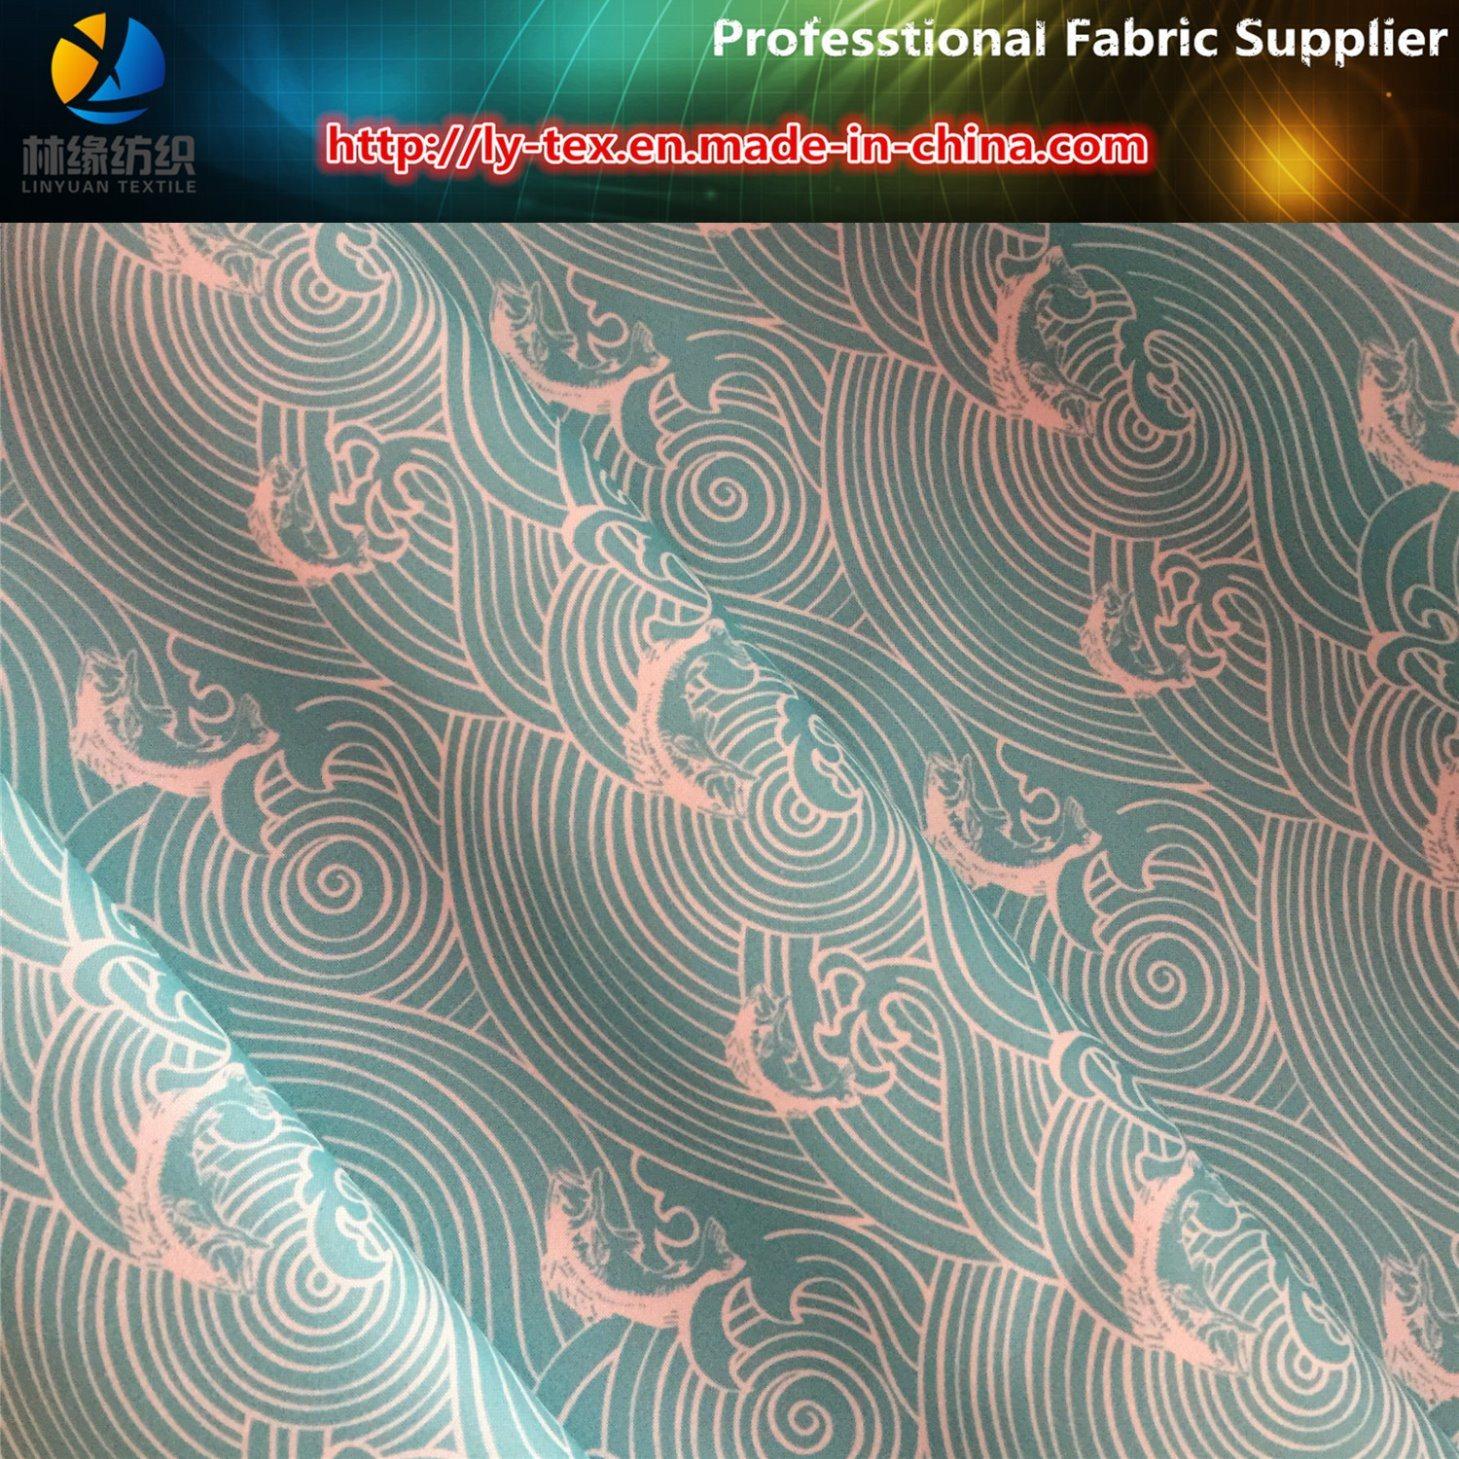 150d Polyester Twill Gabardine Printed Shirting Woven Fabric